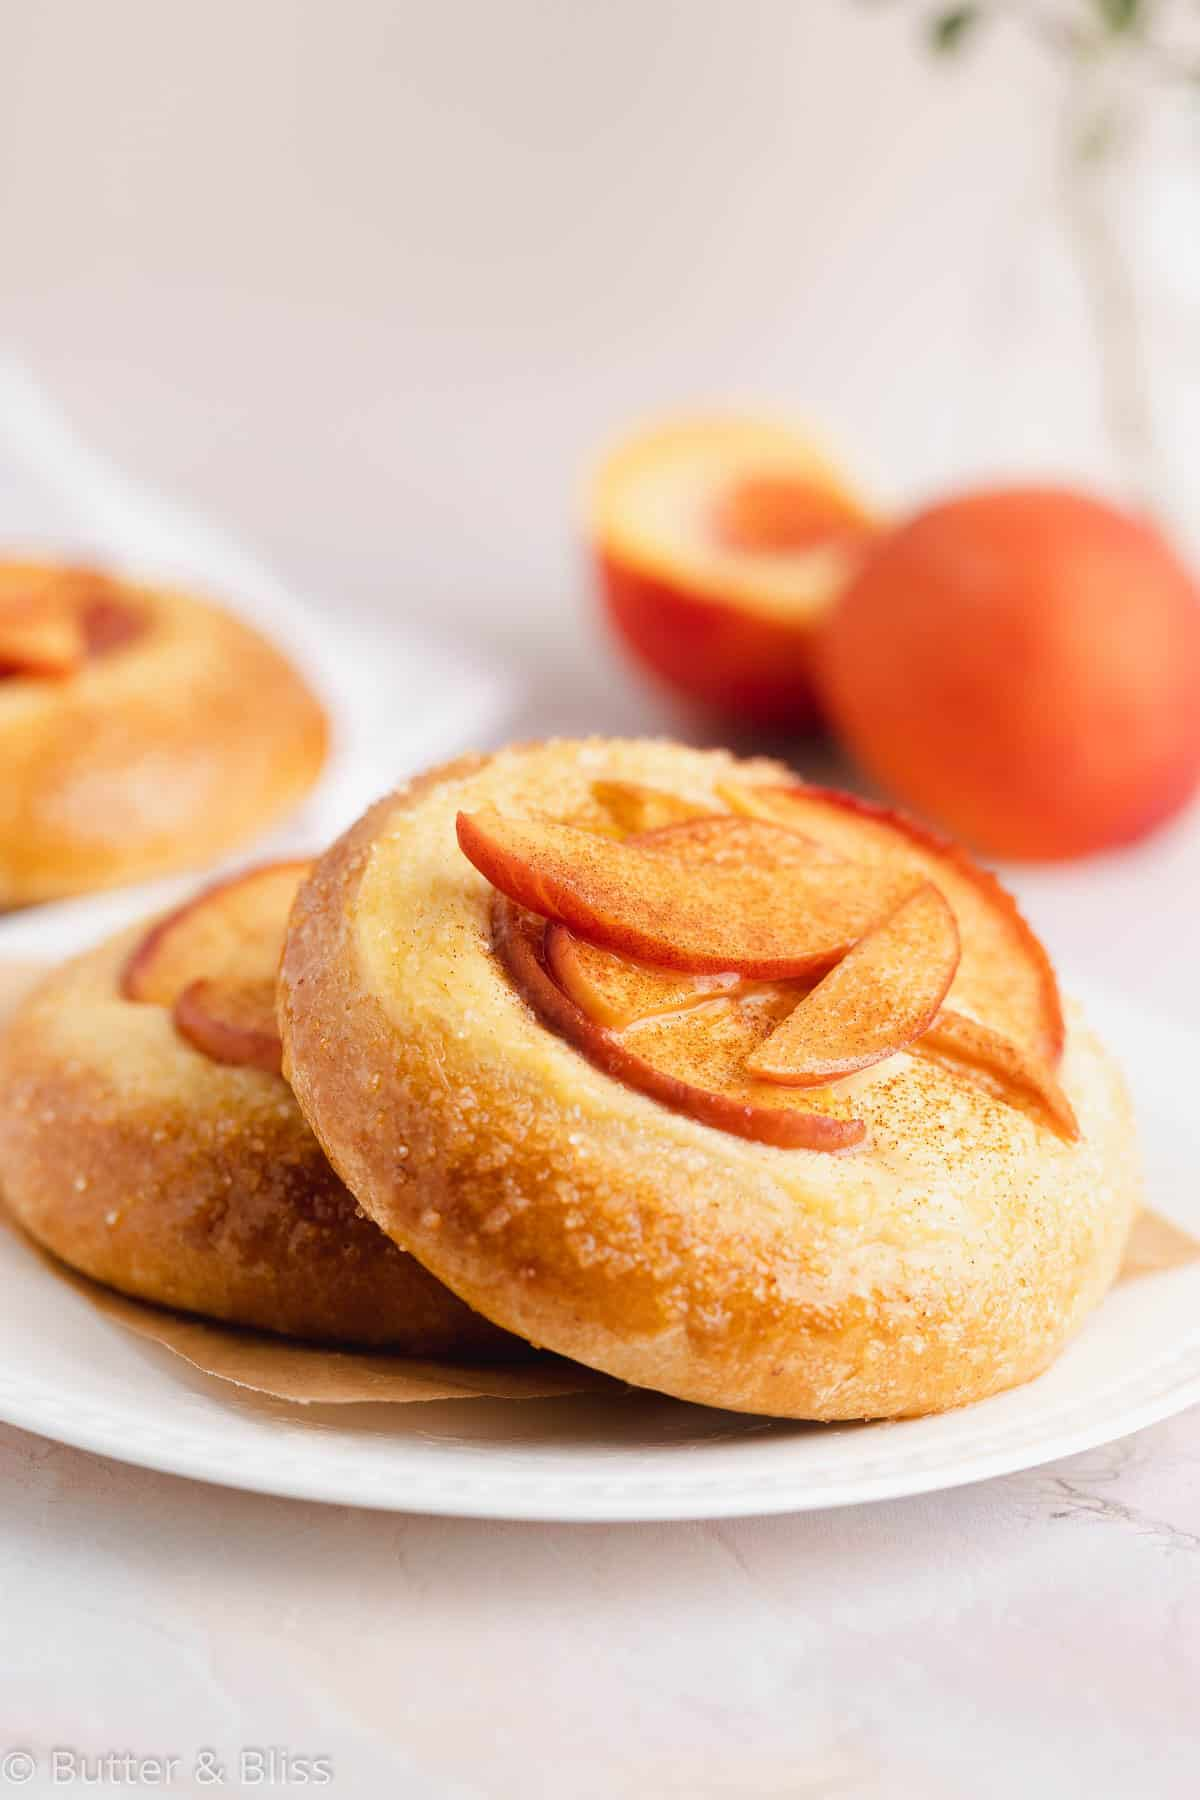 A peach and custard mini pie on a plate